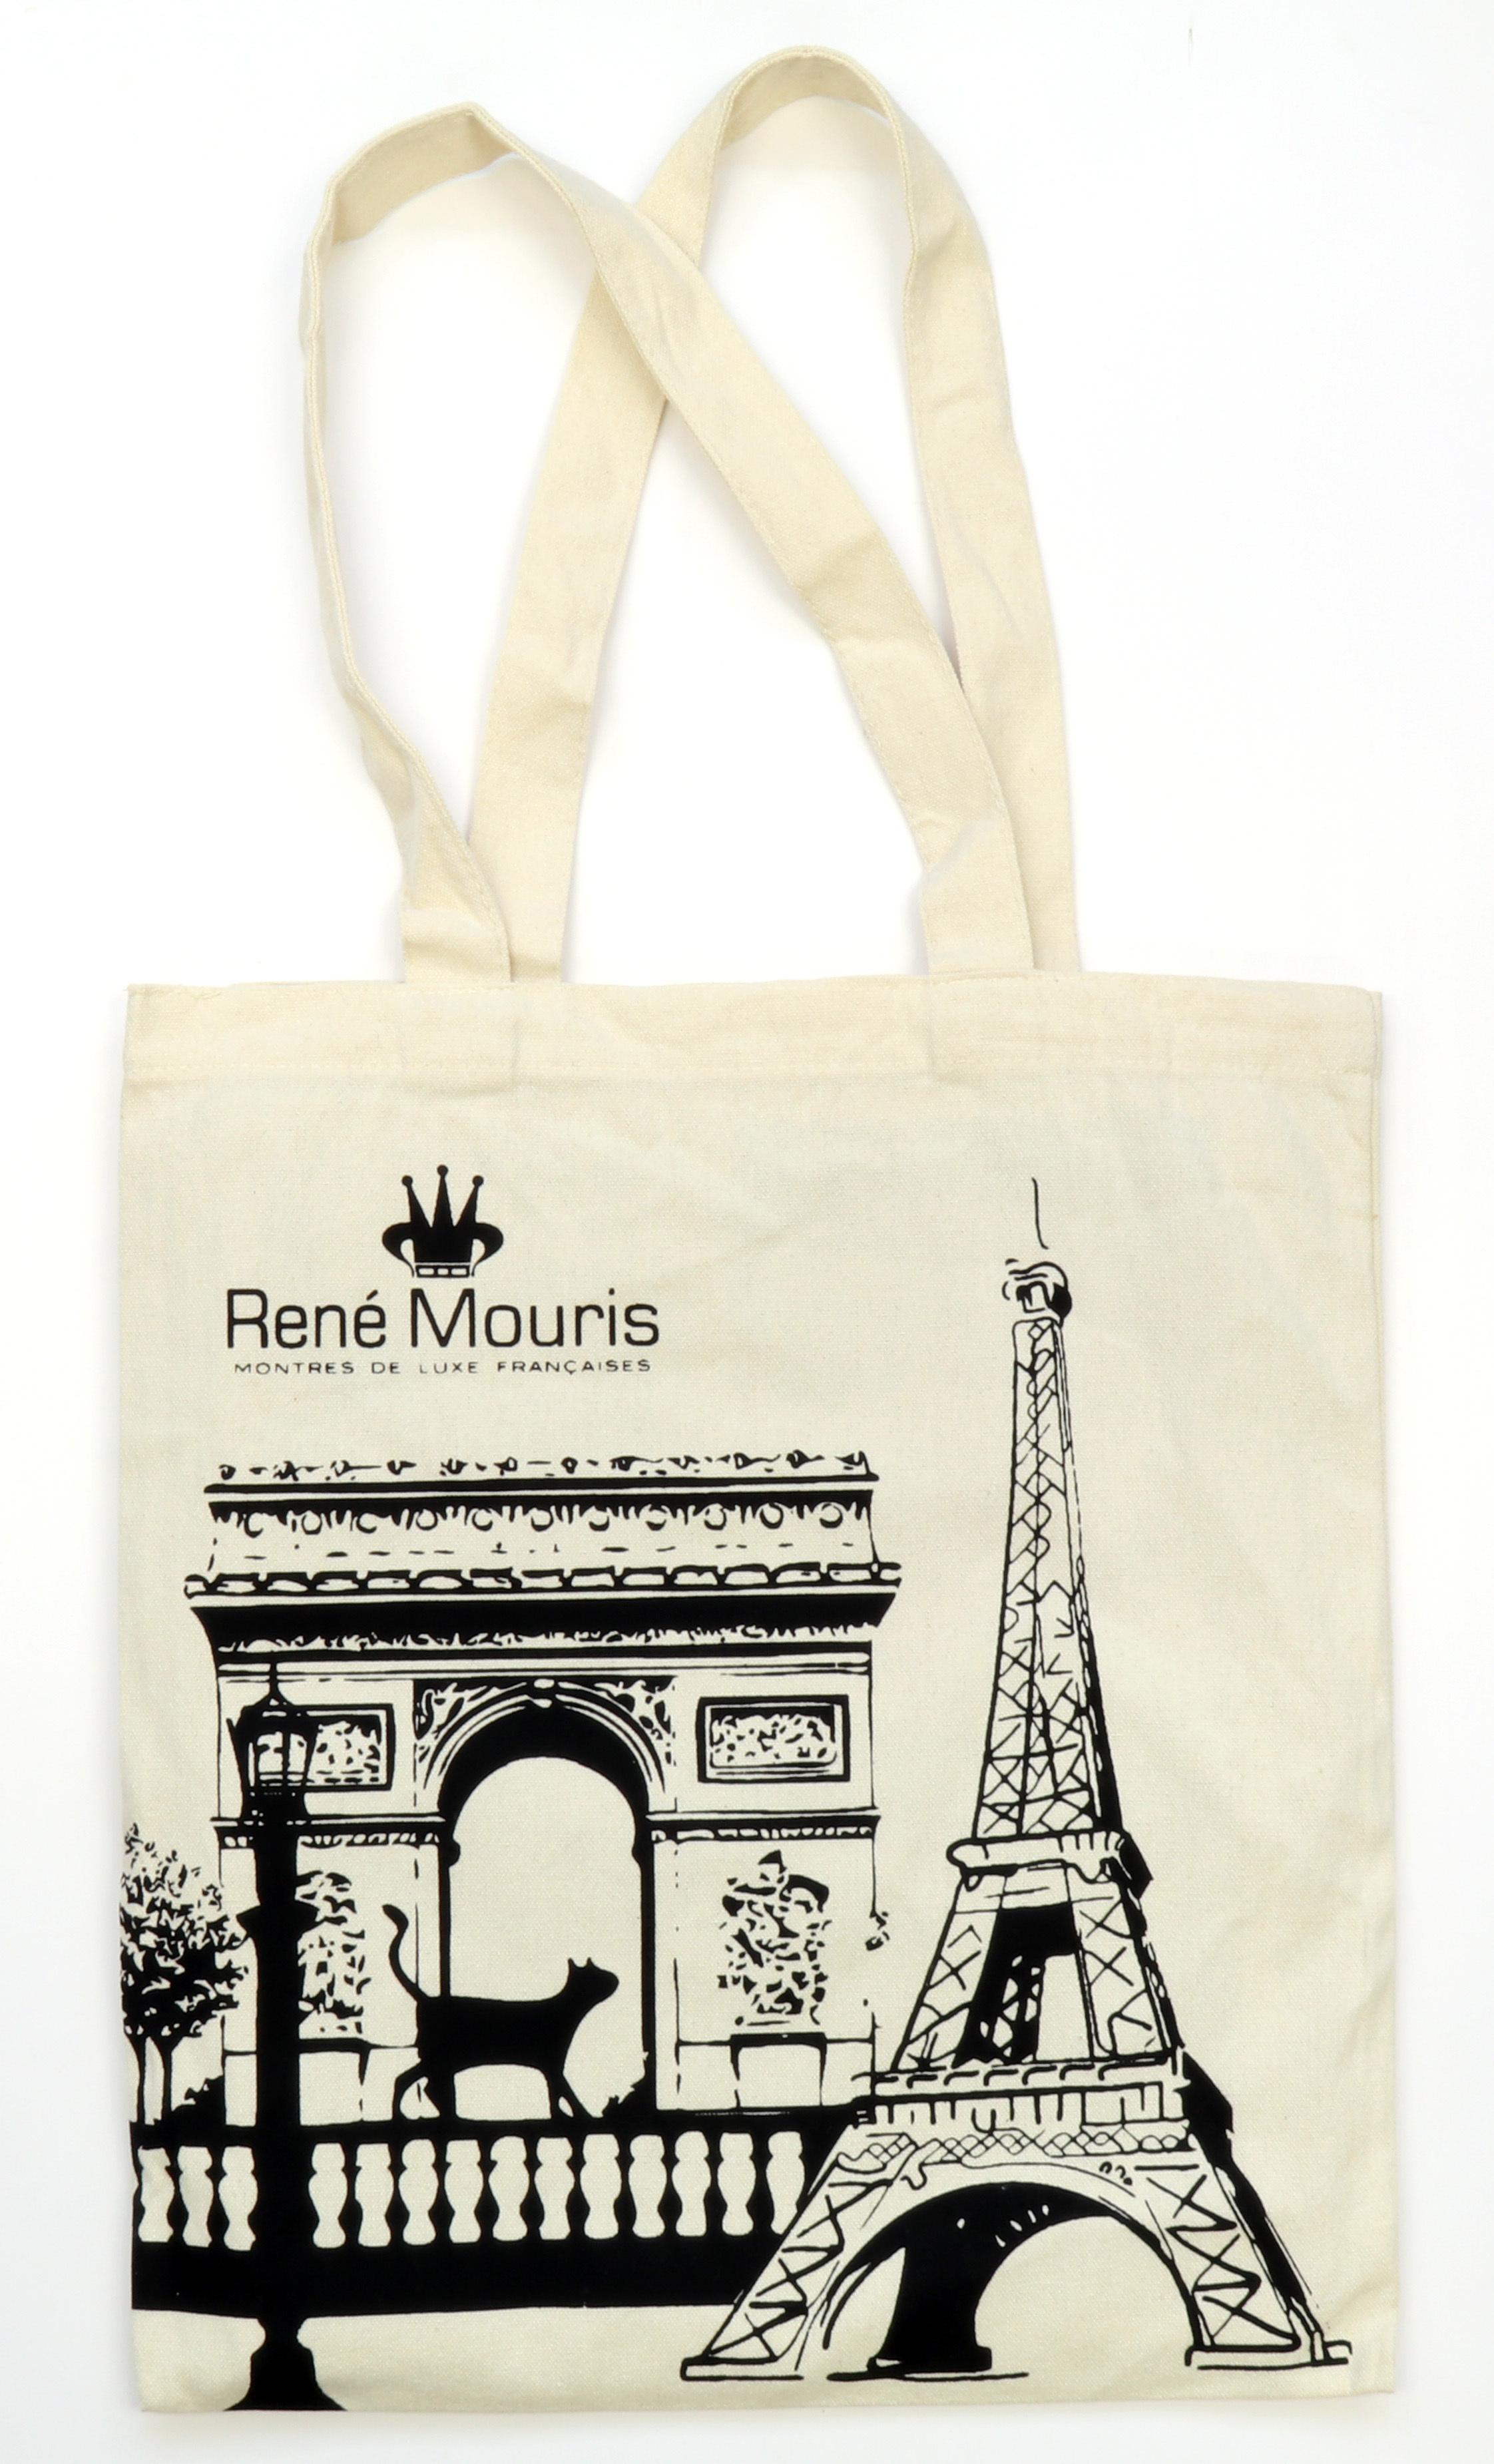 René Mouris Arc De Triomphe and Eiffel Tower Tote Bag